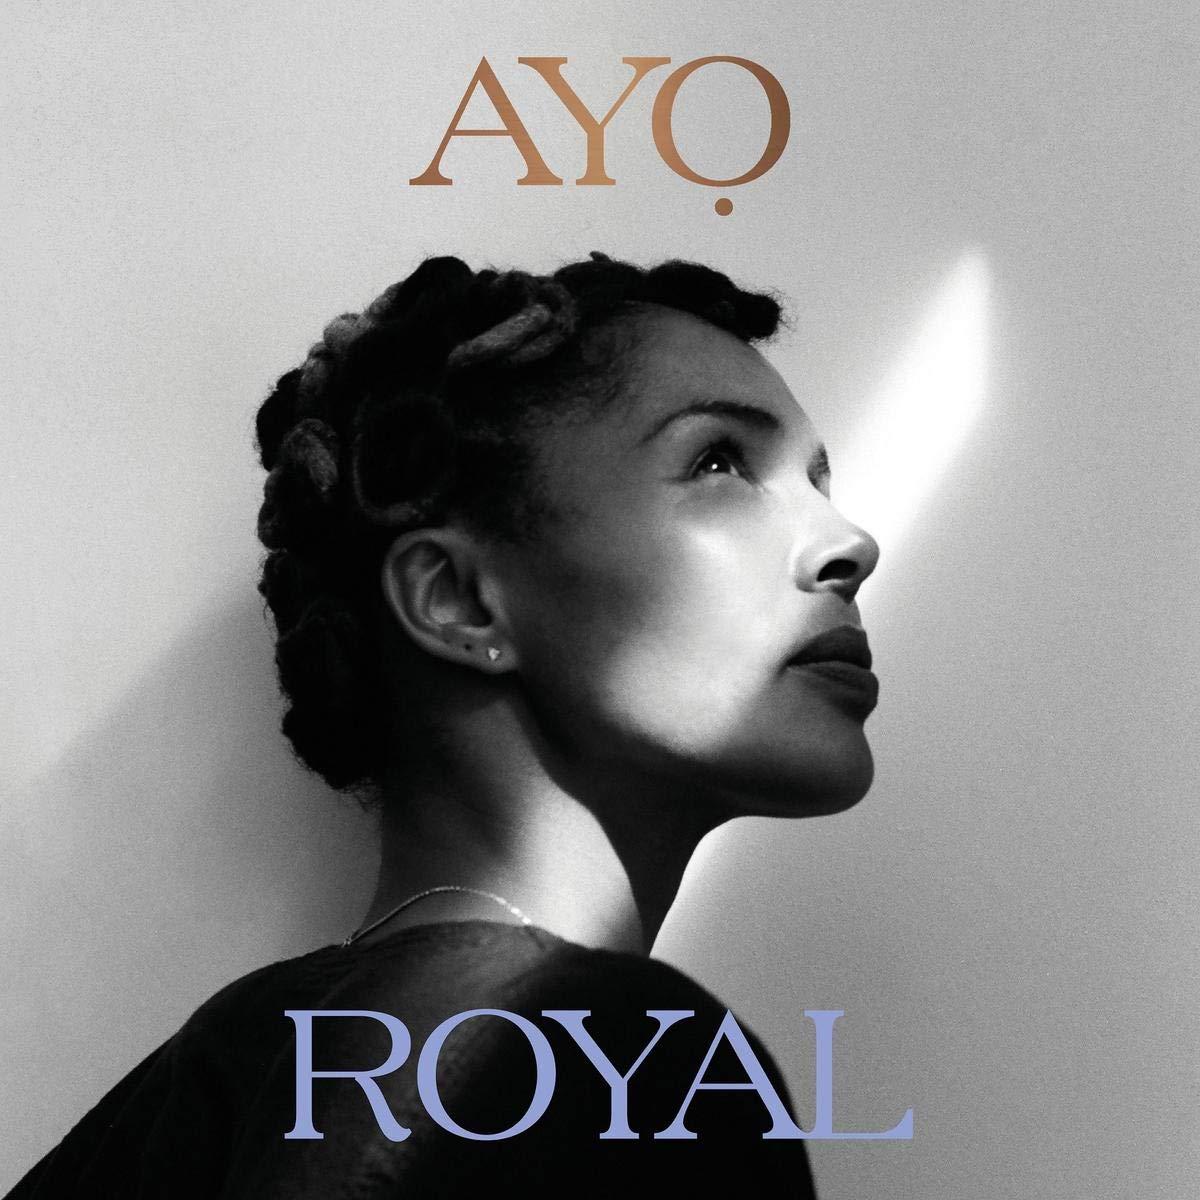 AYO – ROYAL